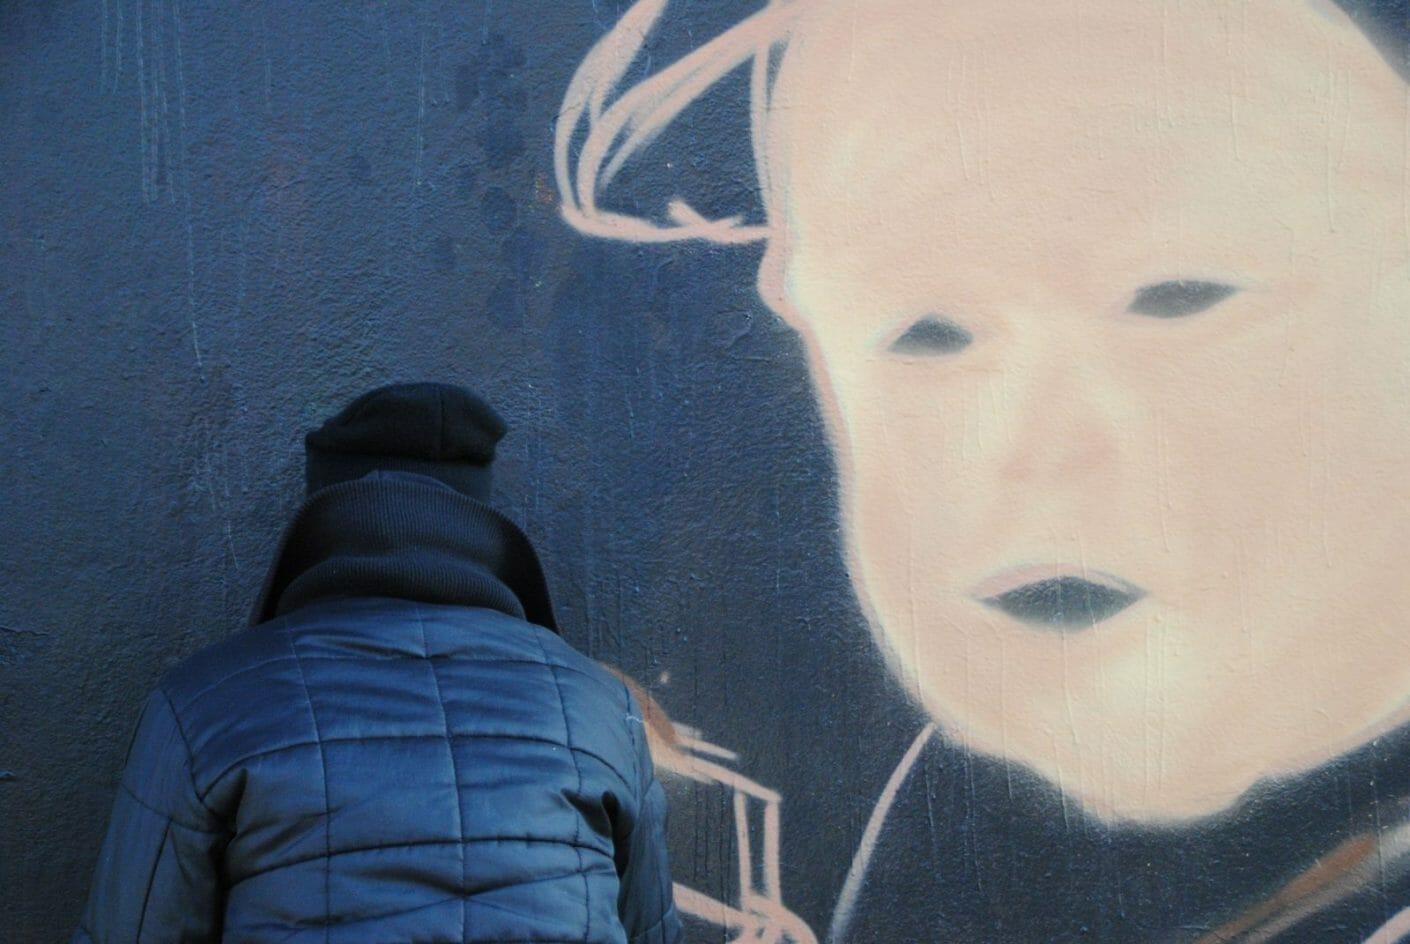 Kwim & Kraco x Le Mur Saint Ouen 3